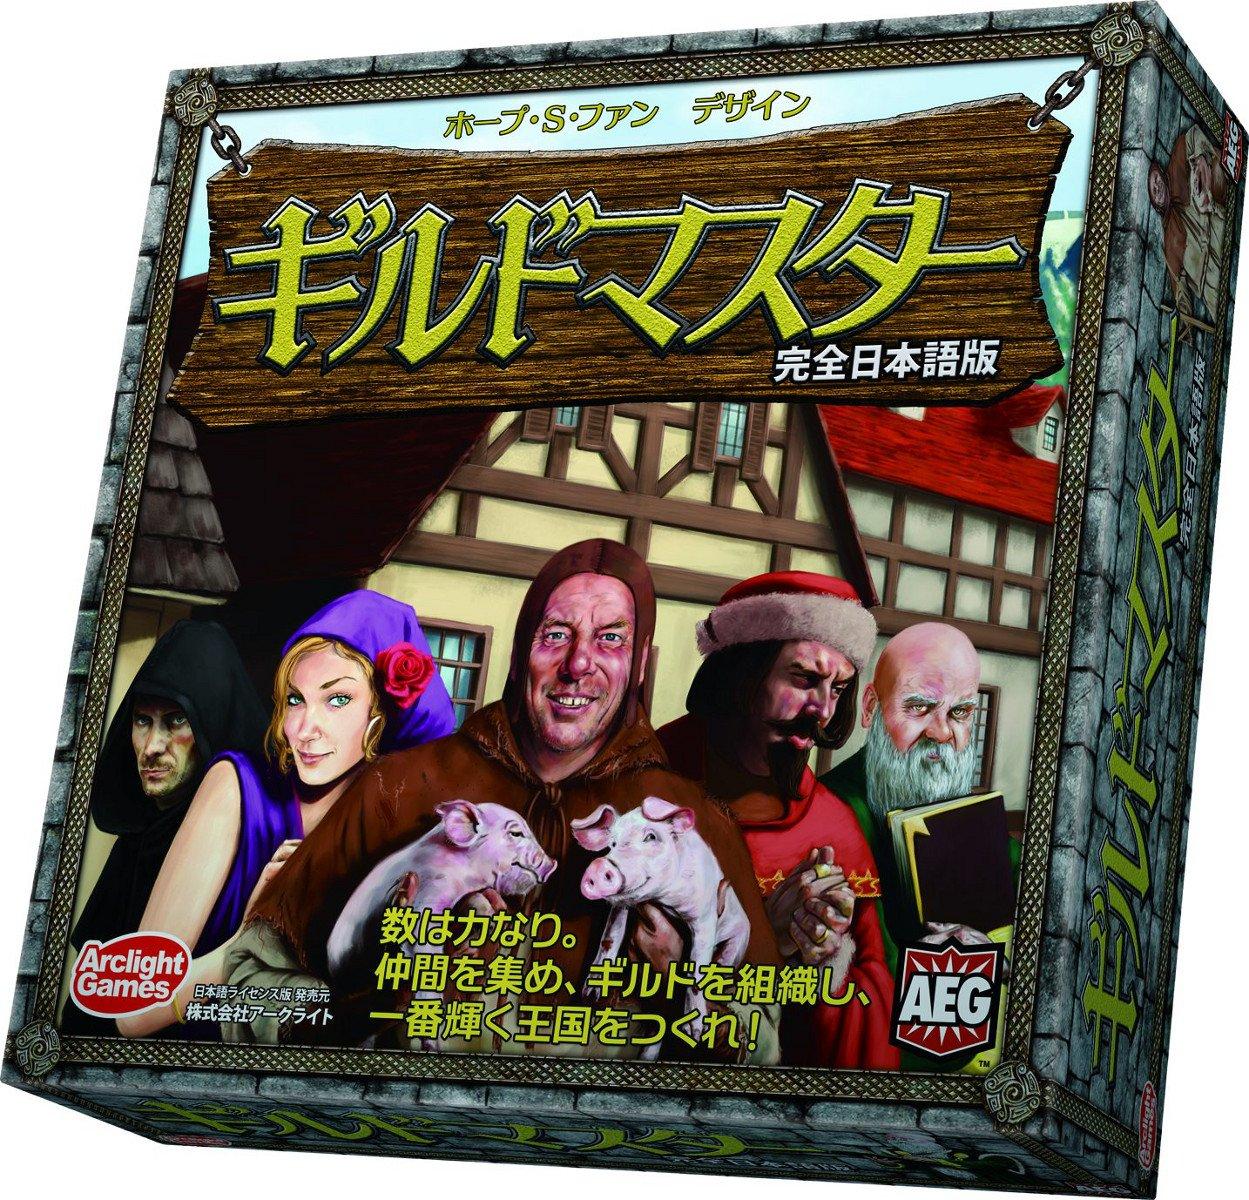 Guild master Japanese version of the full (japan import)